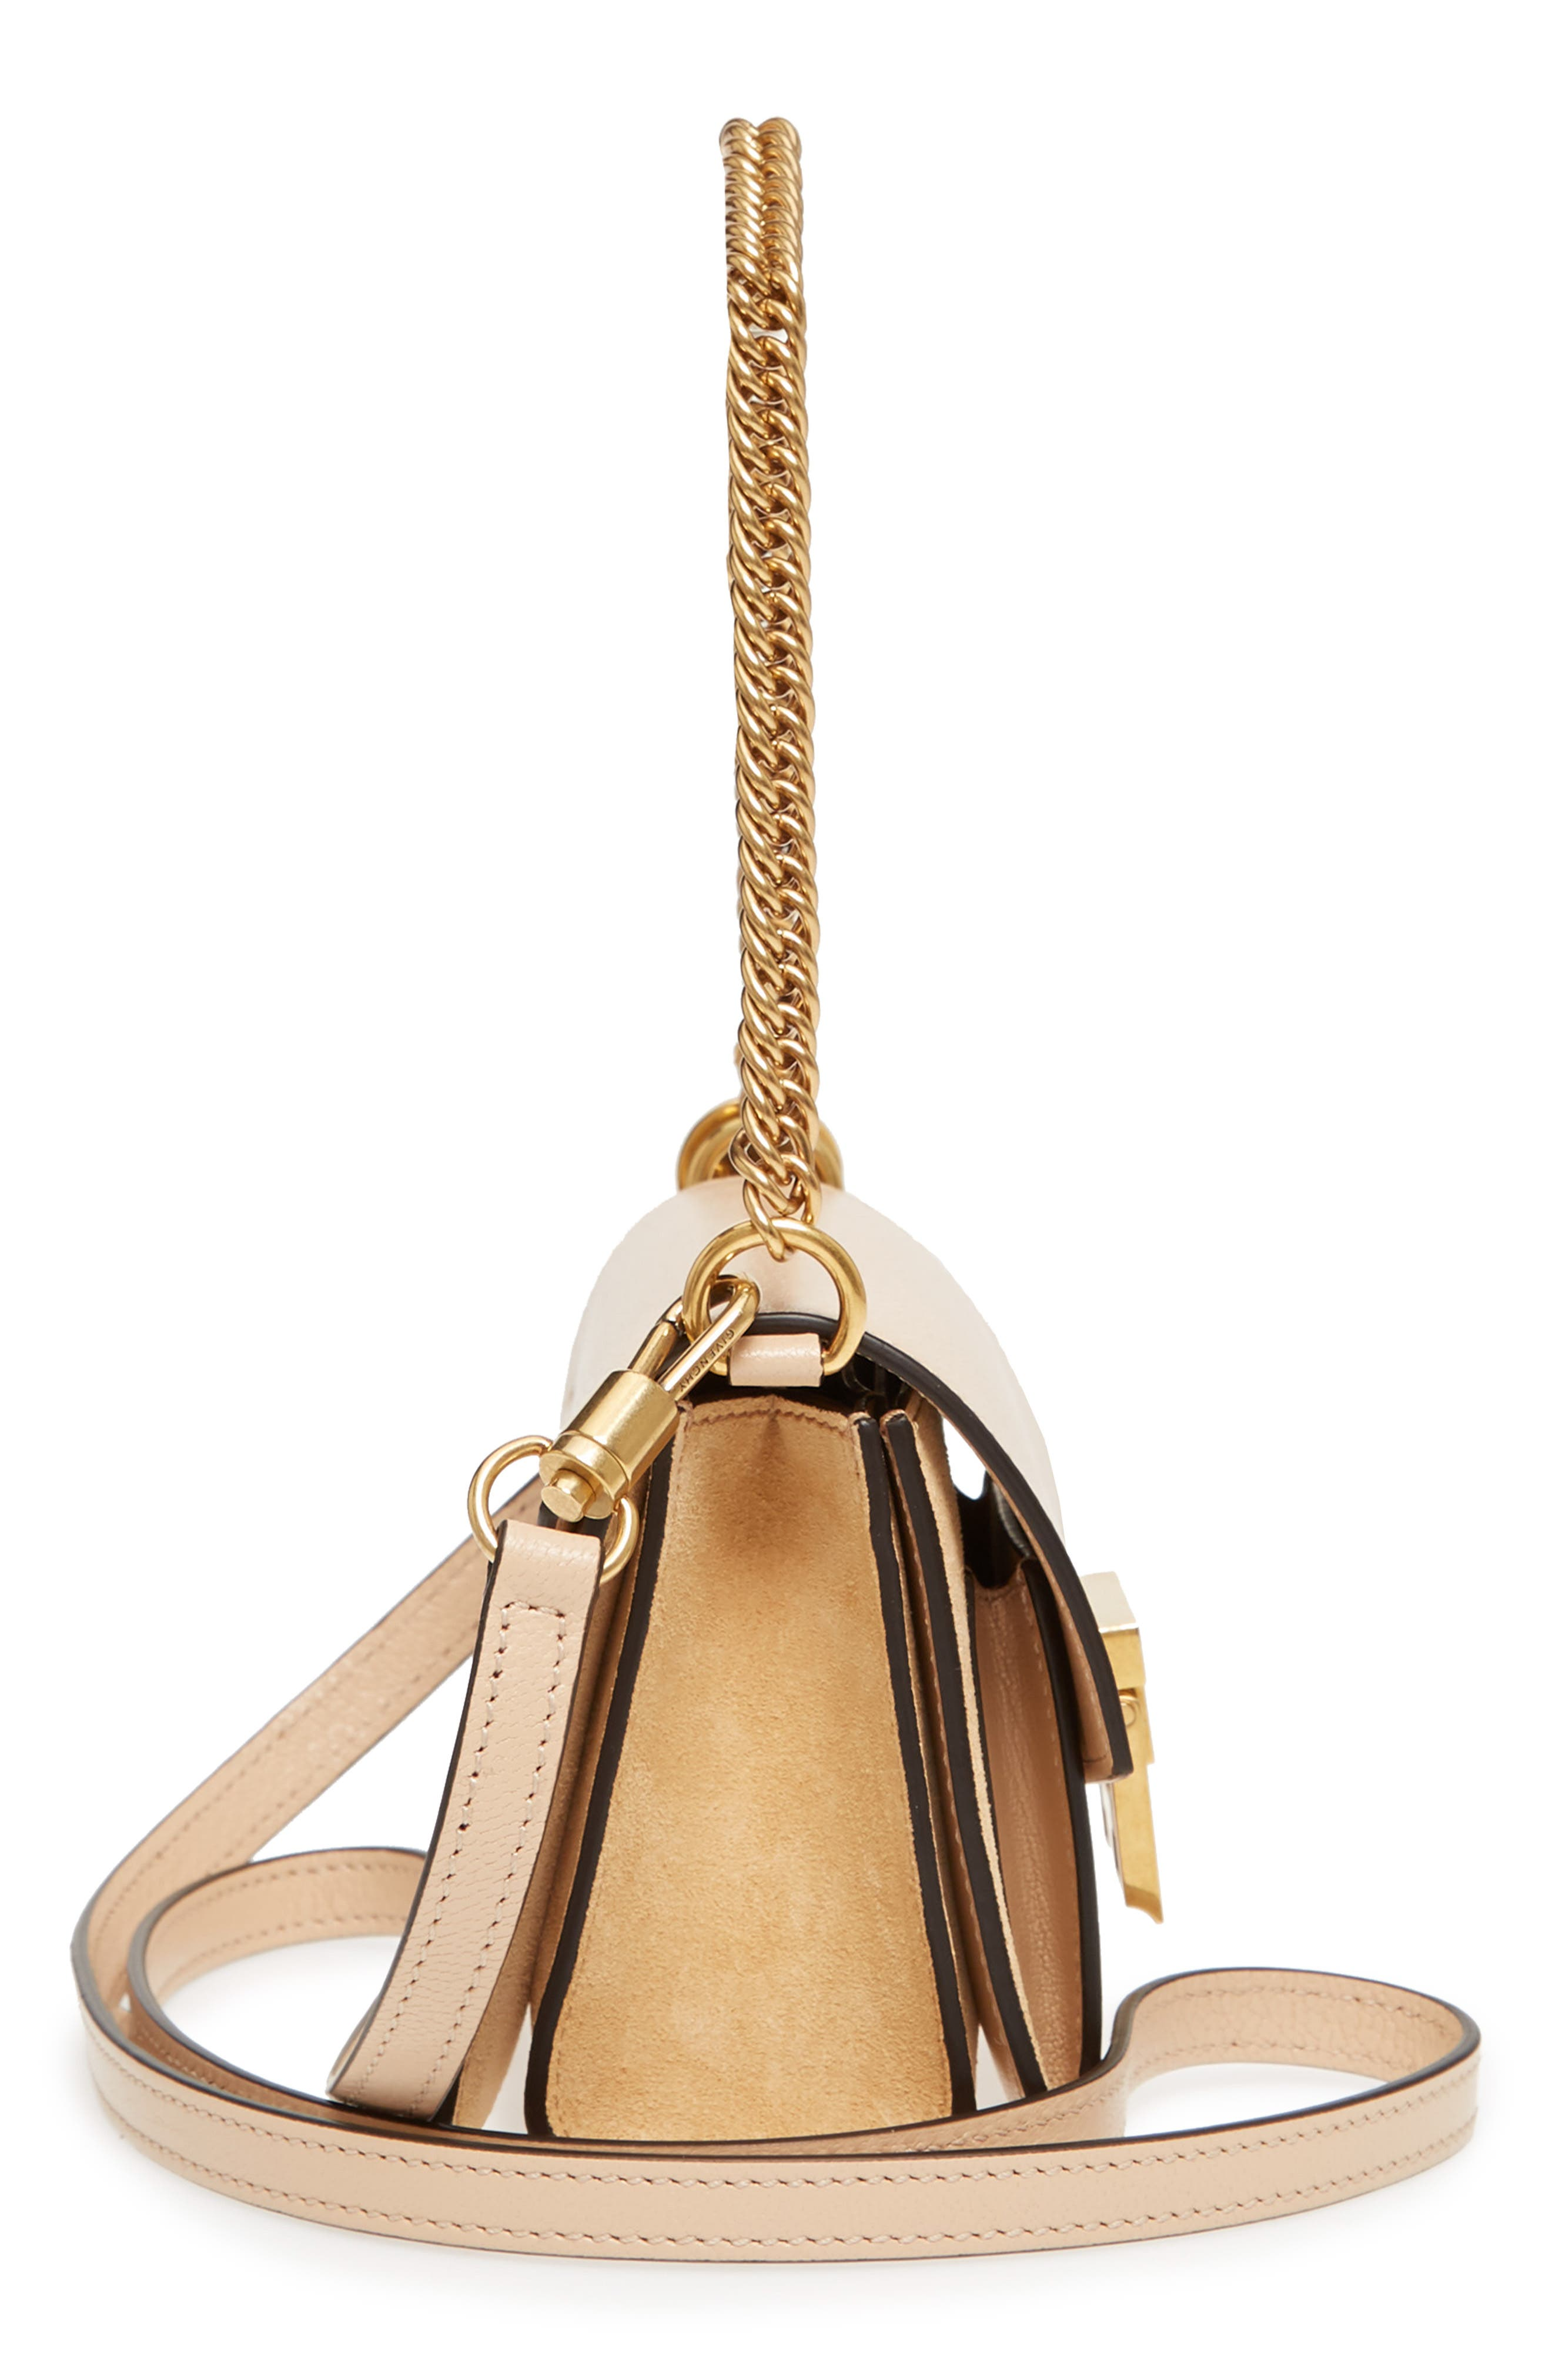 Mini GV3 Leather & Suede Crossbody Bag,                             Alternate thumbnail 4, color,                             Nude/ Light Beige